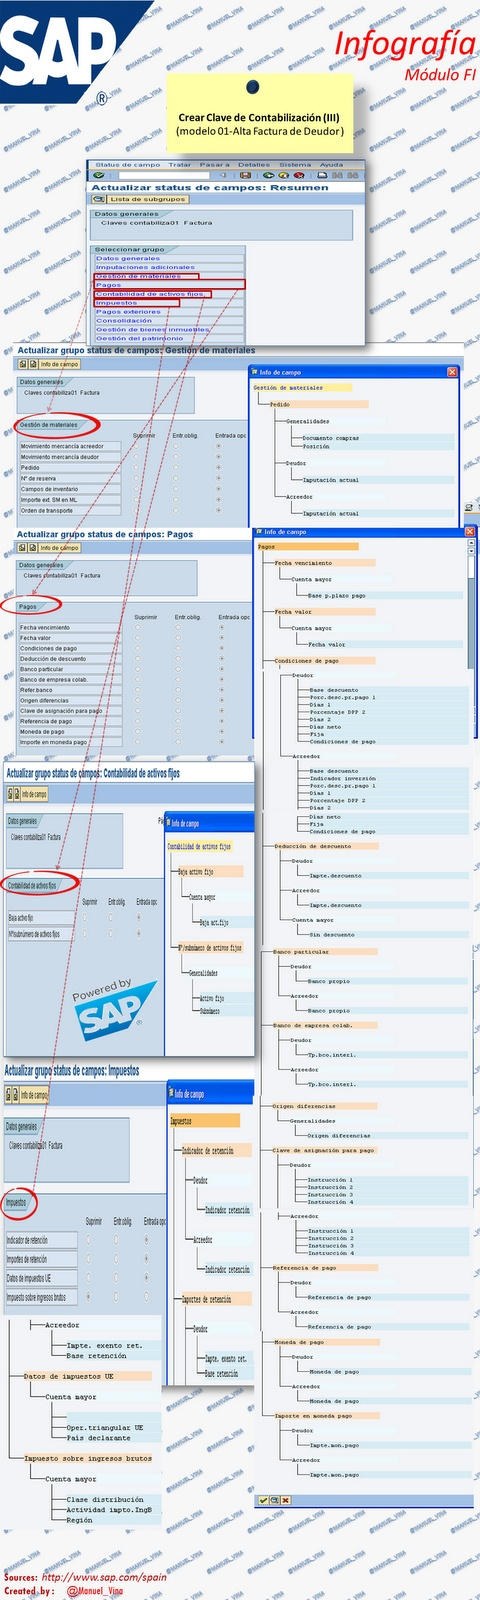 |23| #Infografía sobre #Sap-Fi Crear Clave de Contabilización (III) | Notas prácticas de gestión.